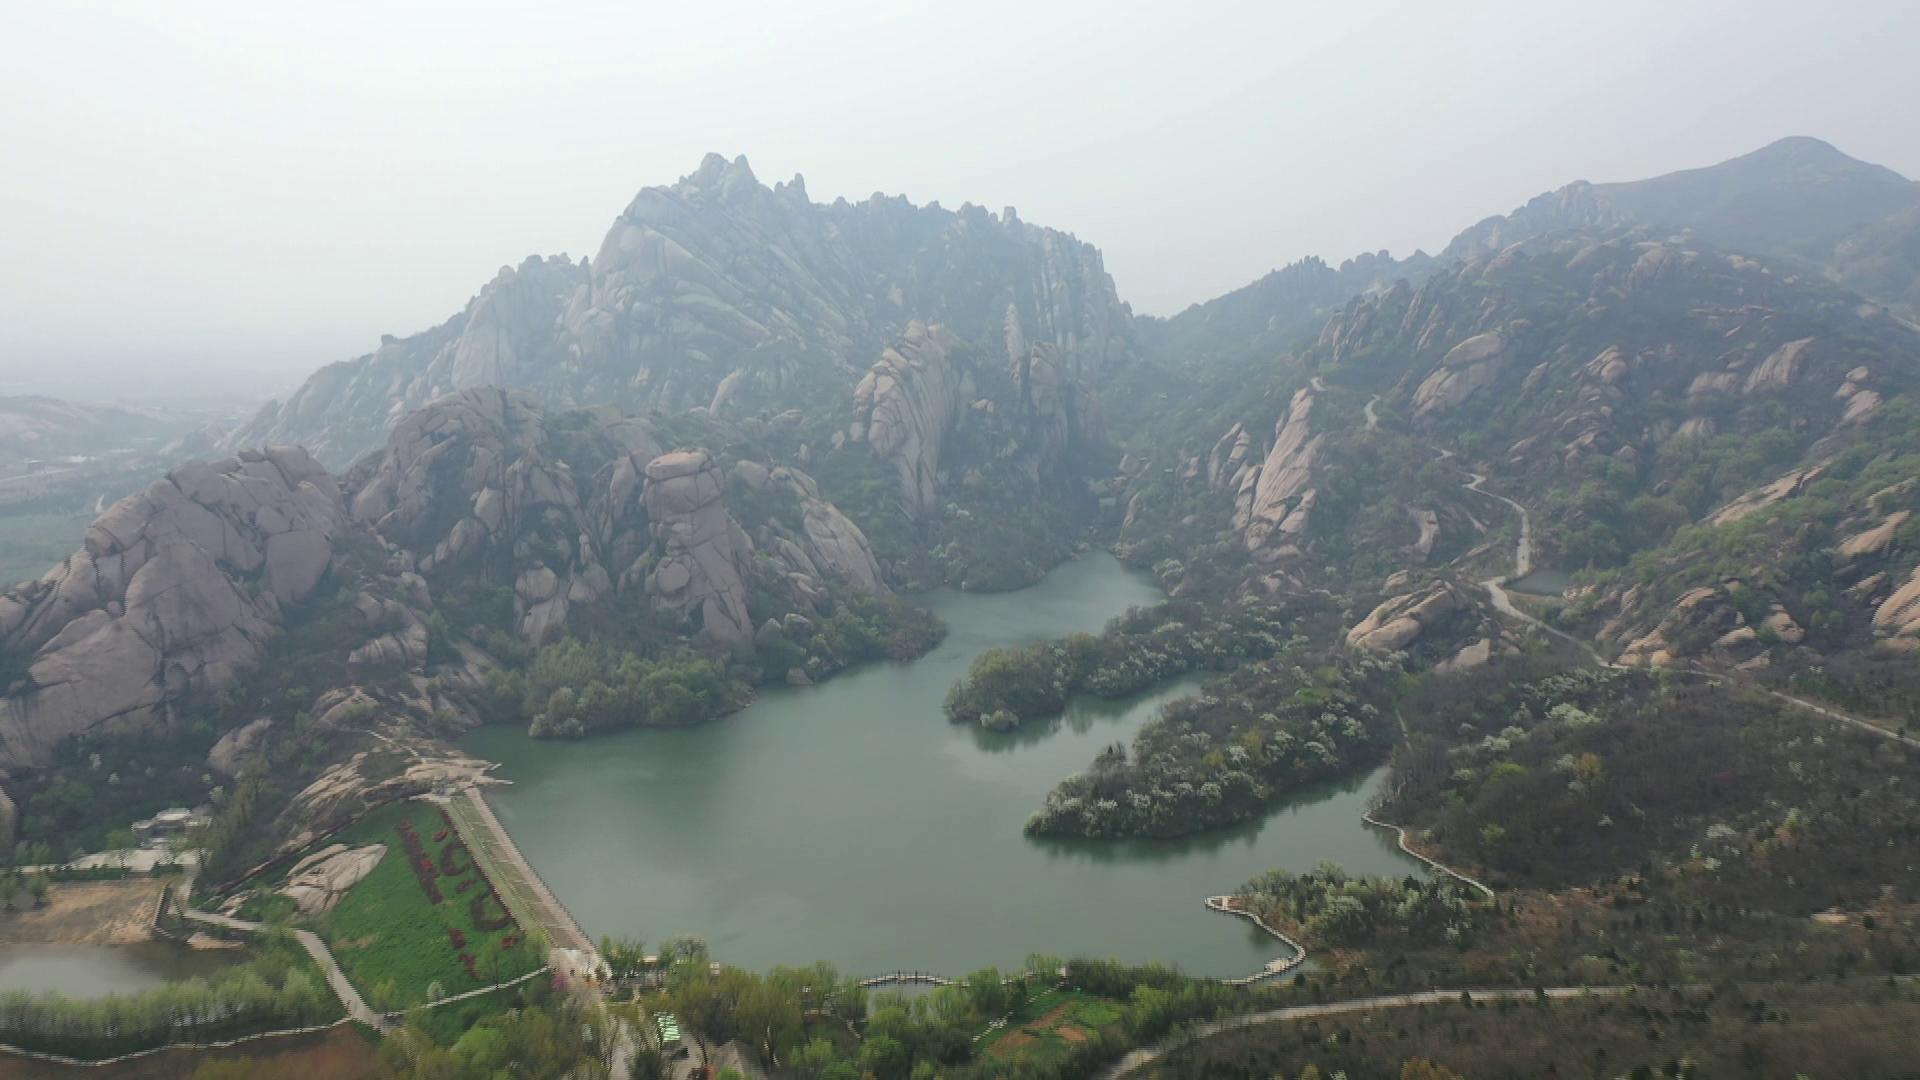 天成(cheng)神韻?)岈(ya)山(shan) 正(zheng)是(shi)春(chun)游(you)好時節